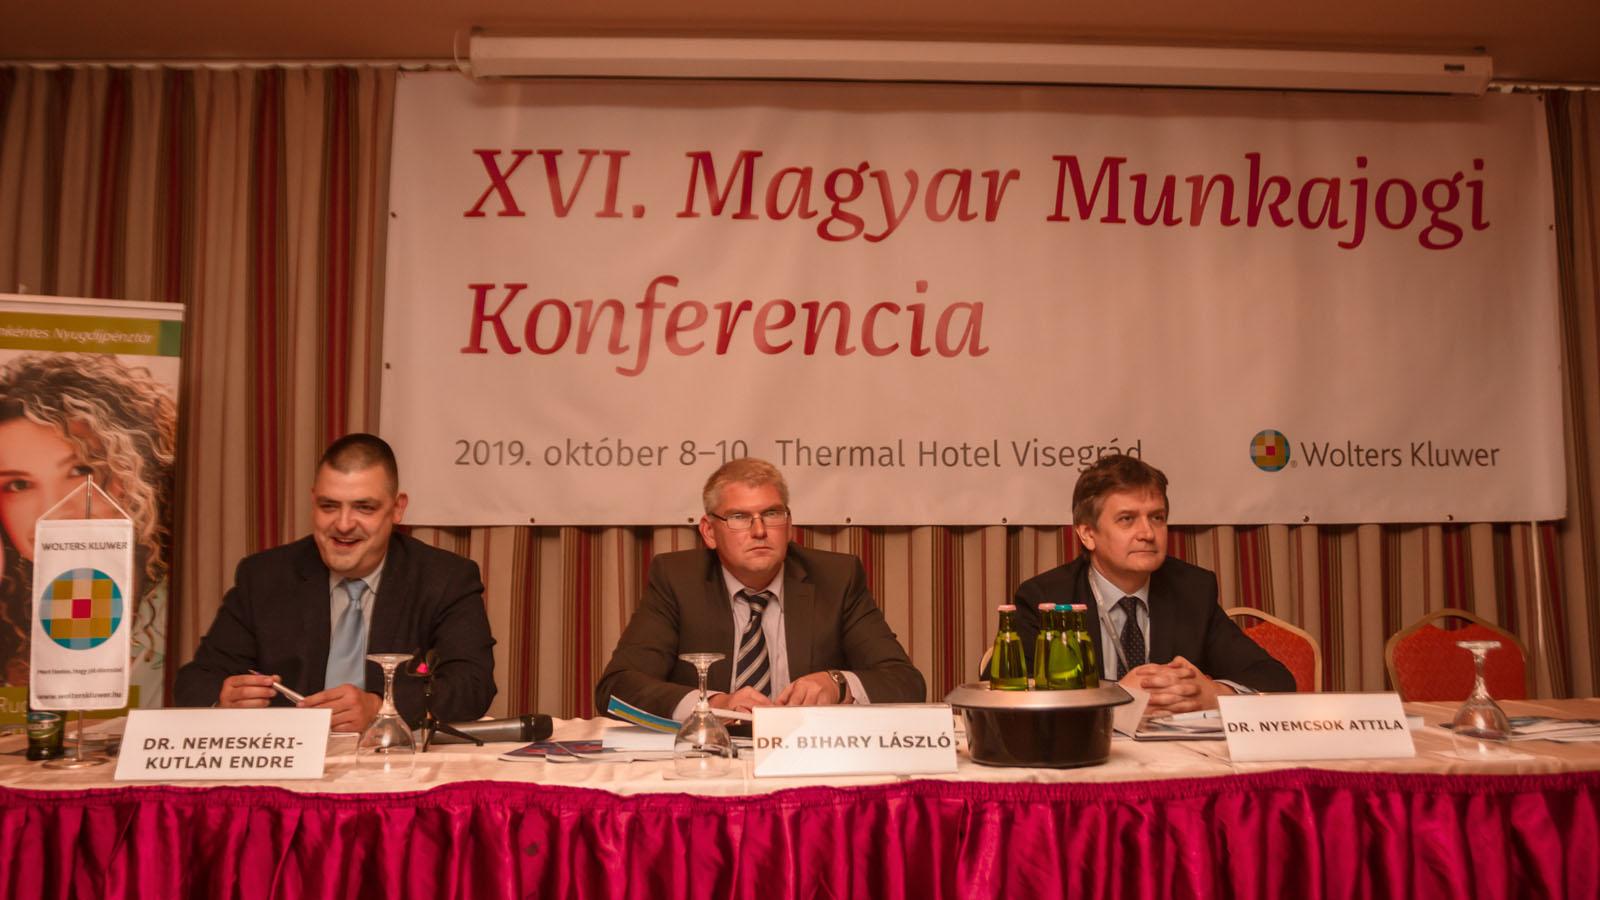 xvi-magyar-munkajogi-konferencia-eloadok